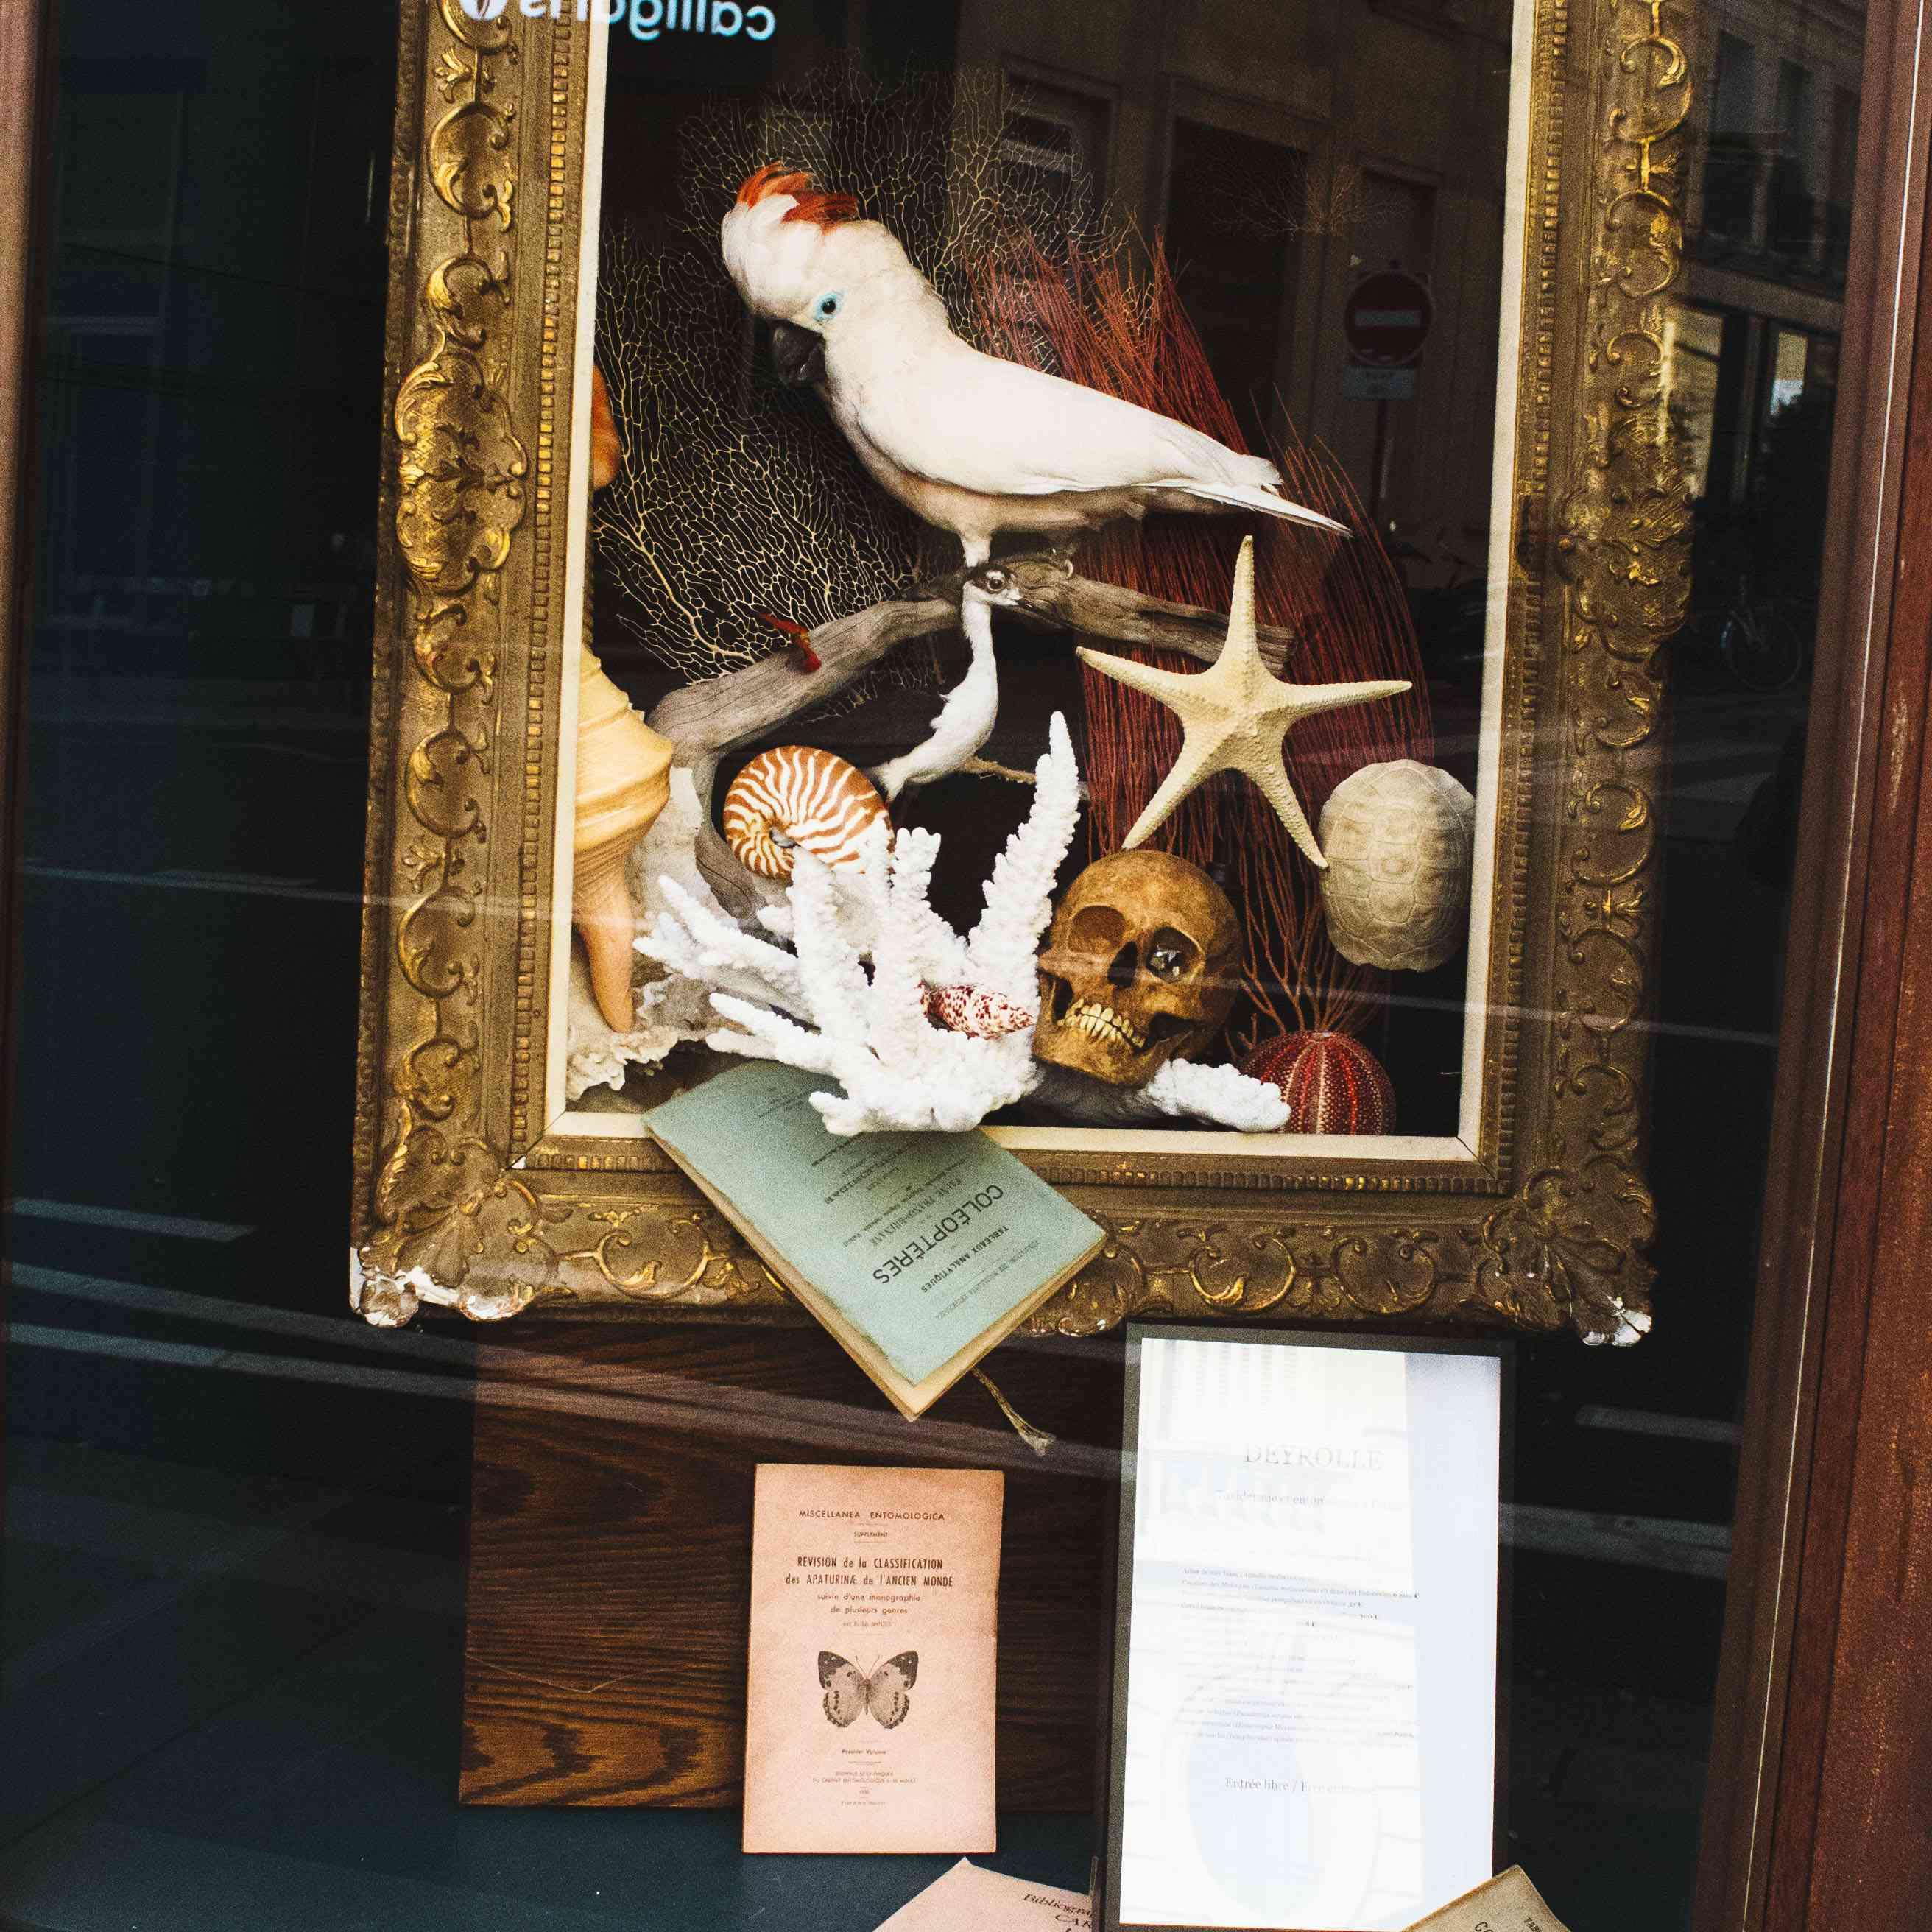 A taxidermy cockatoo in a window display at Deyrolle